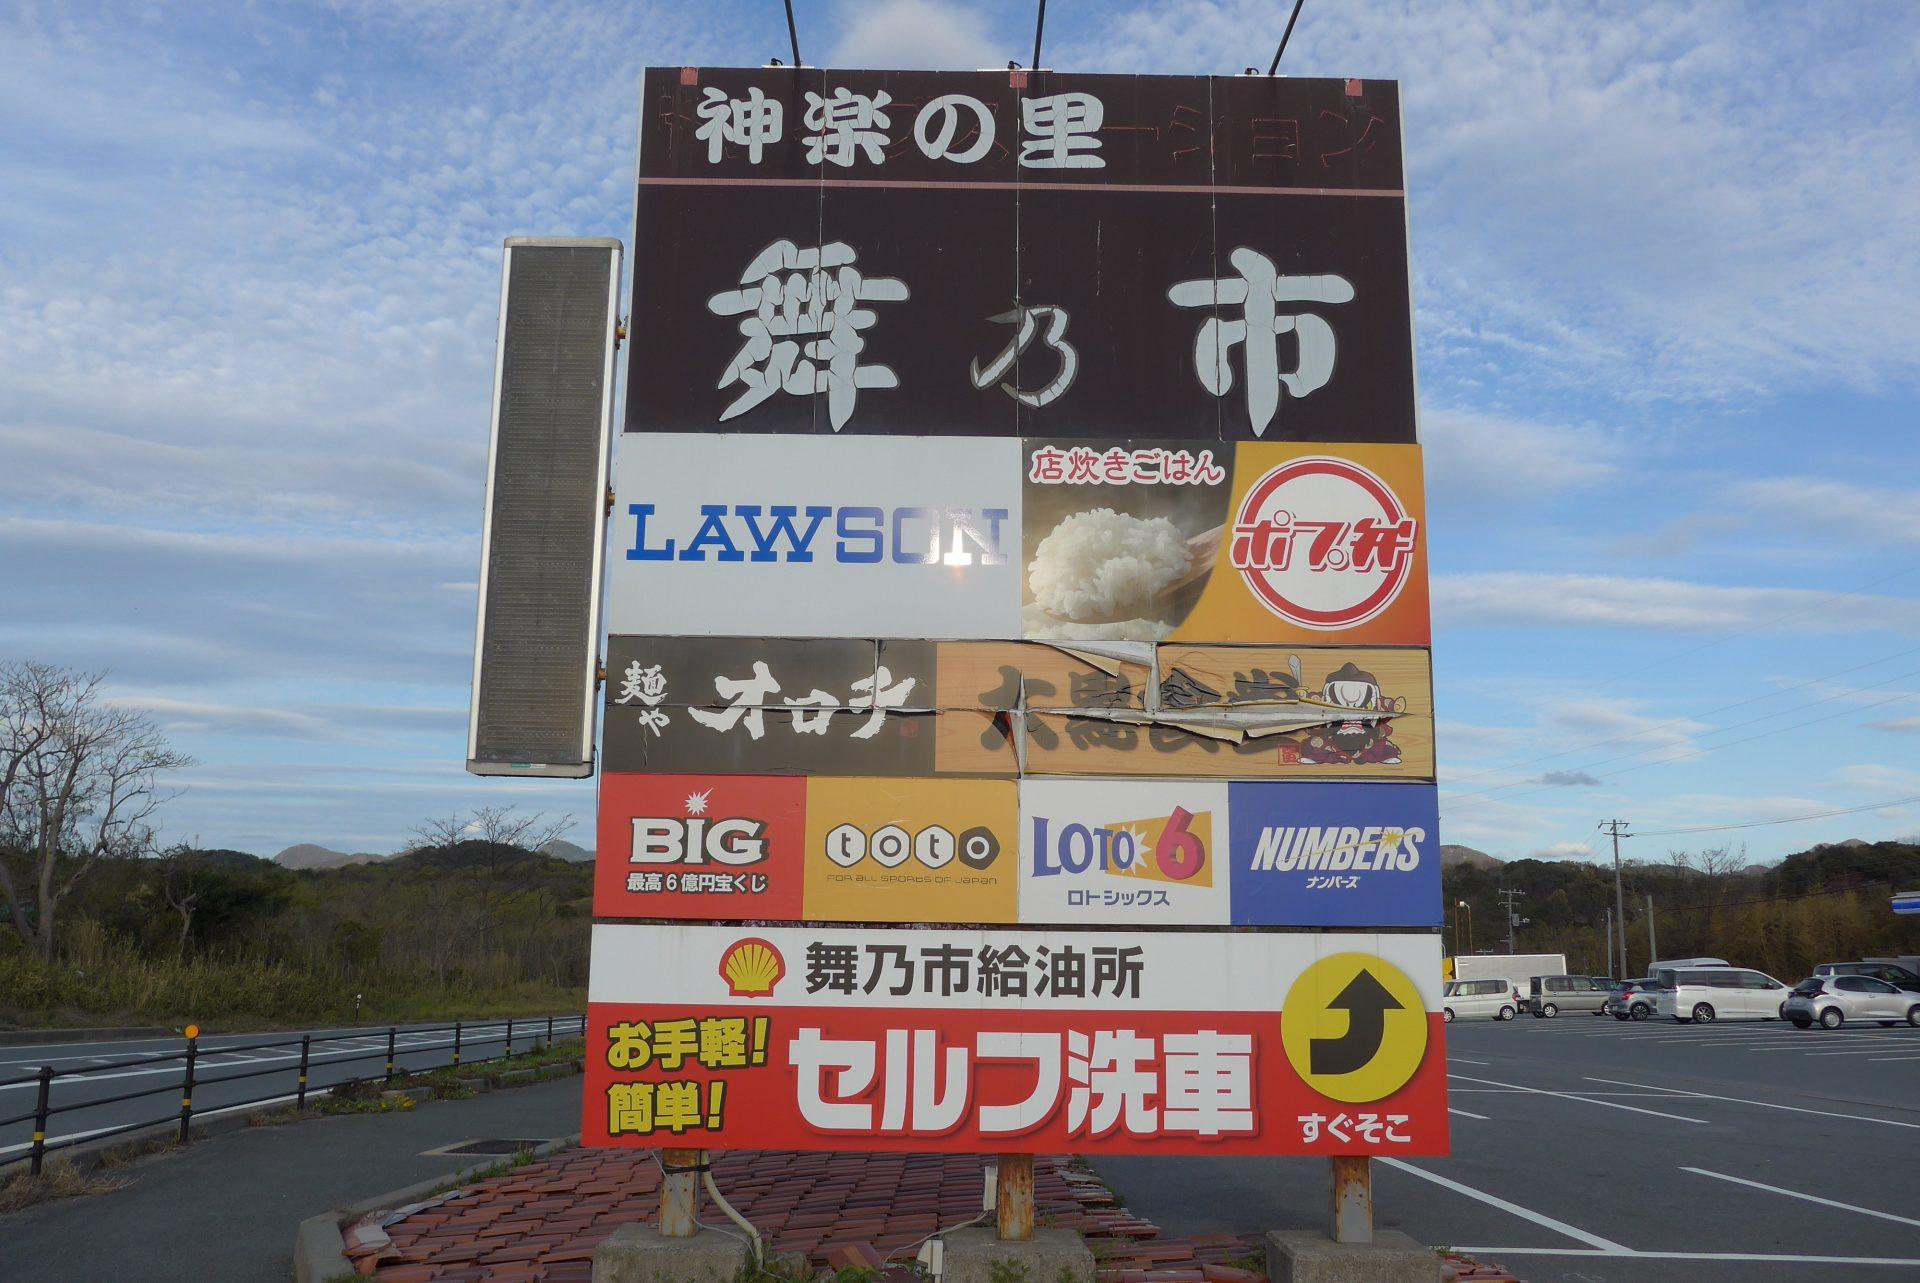 (K)道の駅サンピコごうつの車中泊〜コンビニや食堂!ラーメン店も